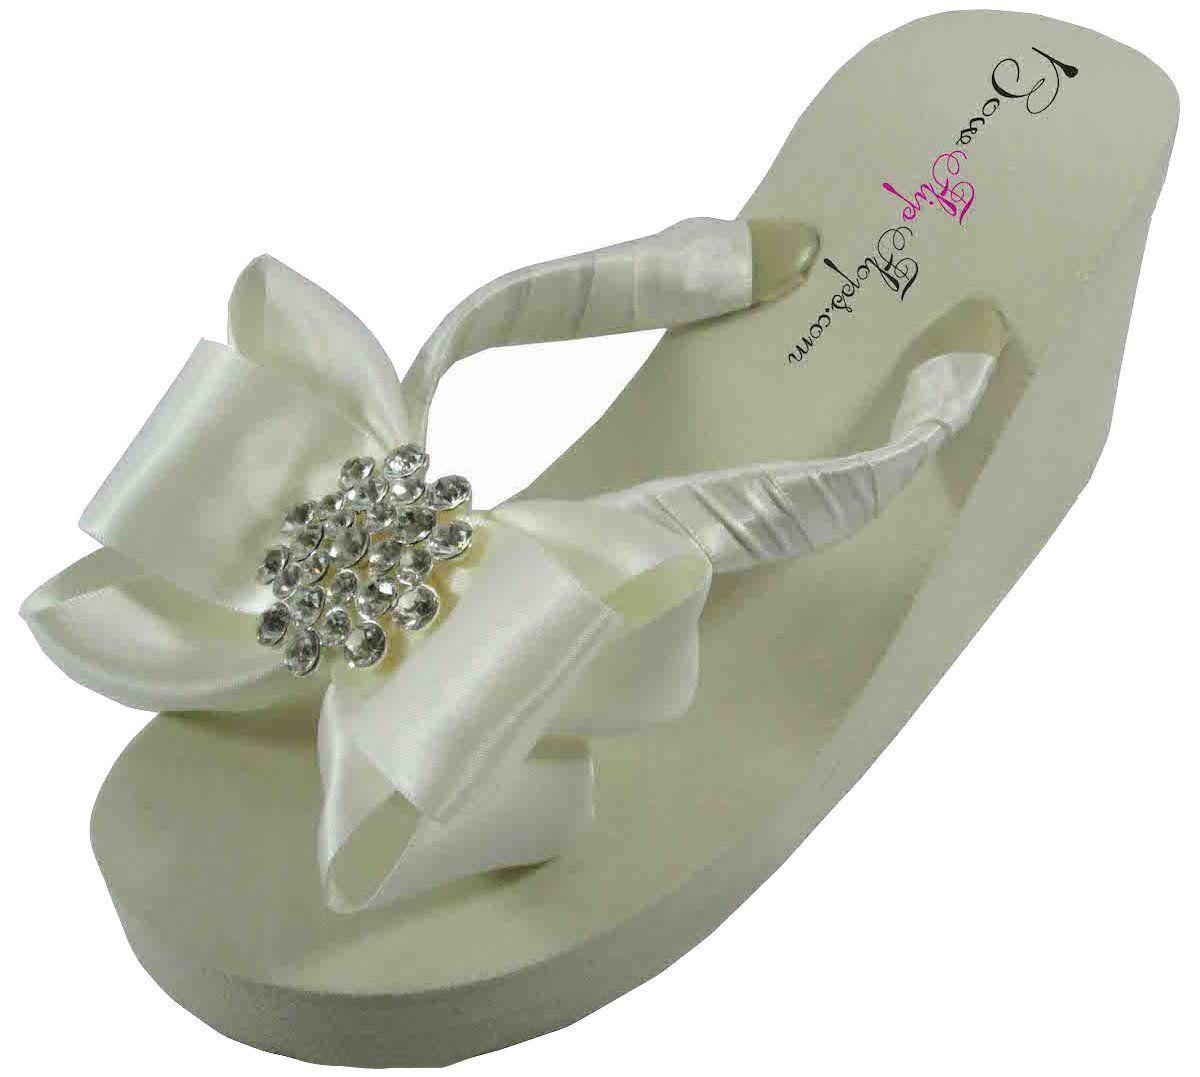 887f86df7 Amazon.com  Bridal Flip Flops Ivory White Wedge Womens Wedding Platform  Rhinestone Satin Bow Flip Flops  Shoes